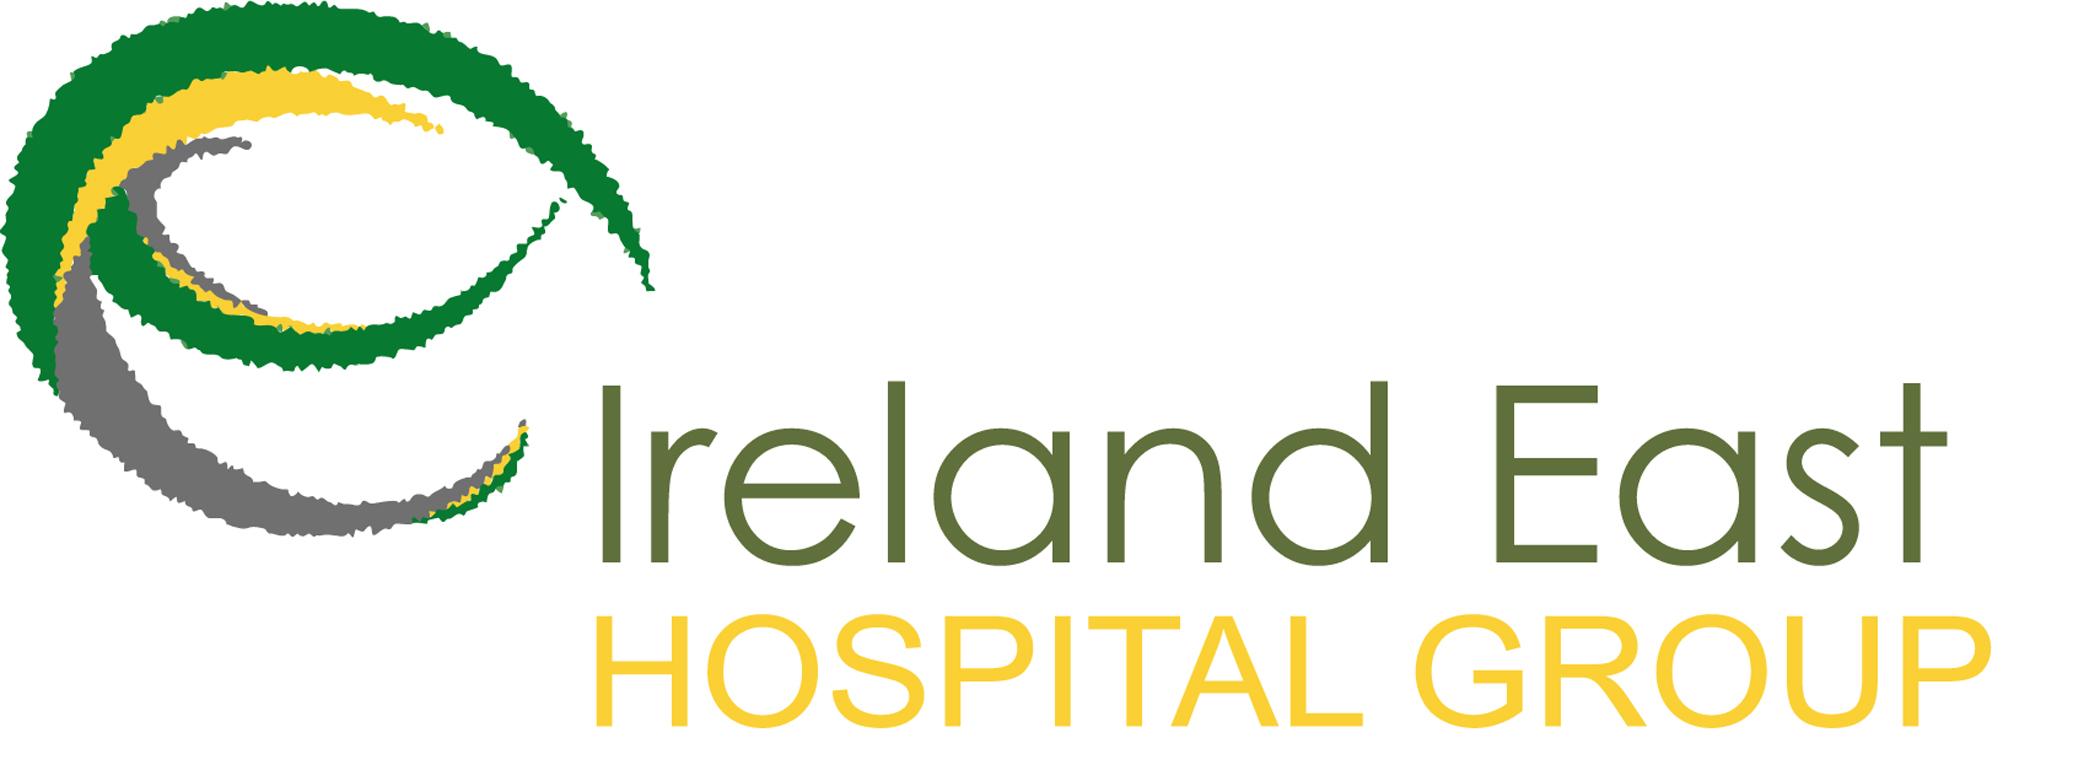 Ireland East Hospital Group (IEHG)